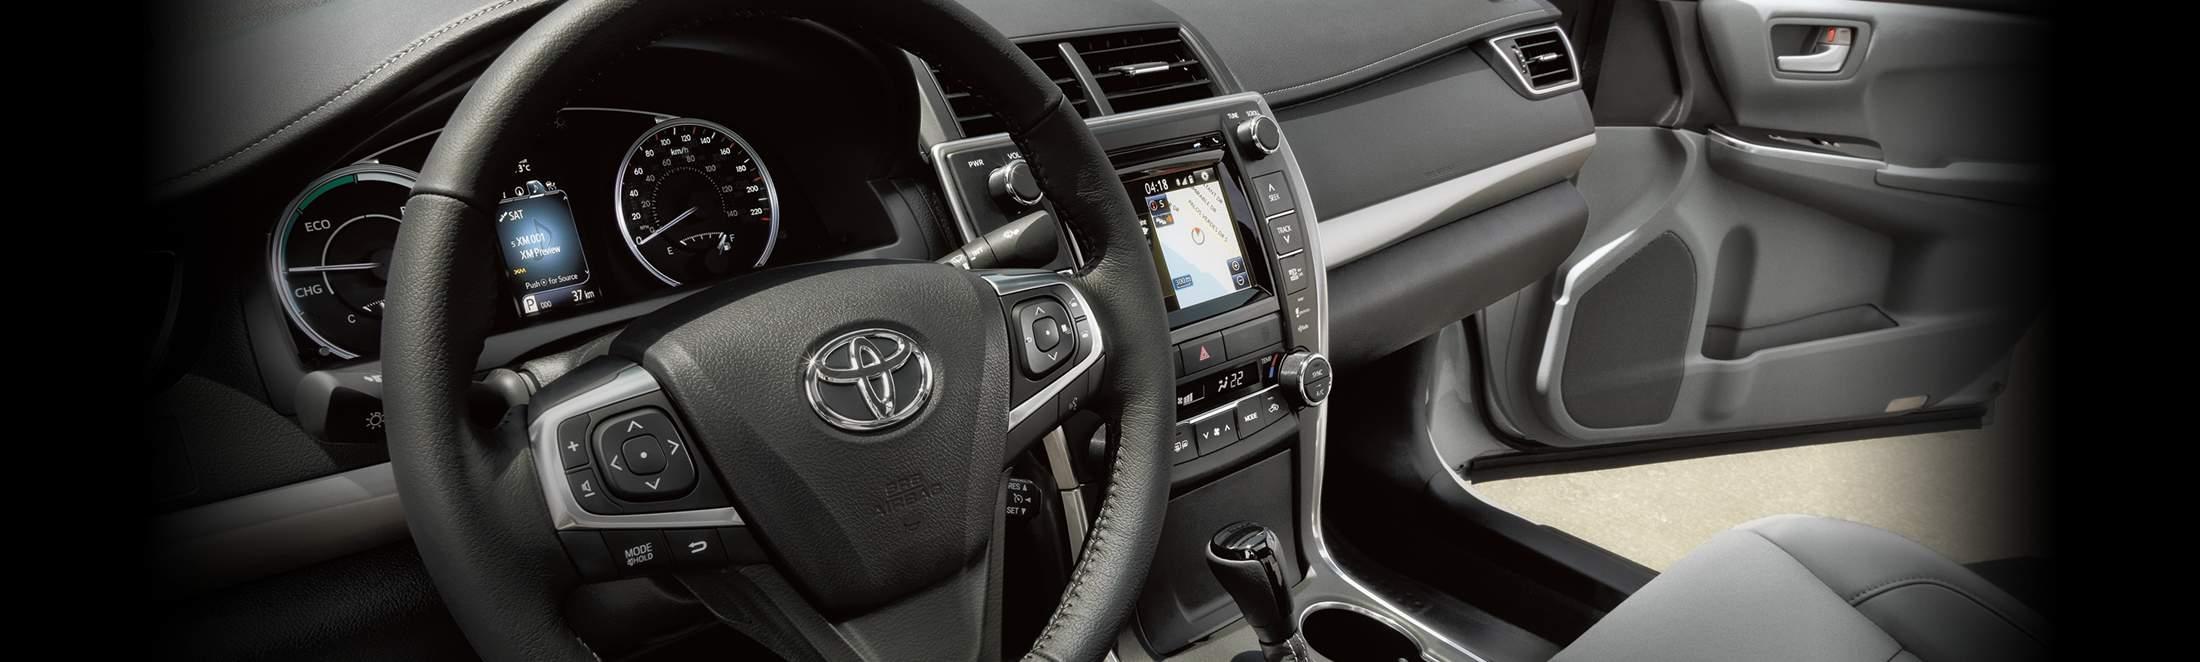 2017 Toyota Camry Le Walkerton Toyota